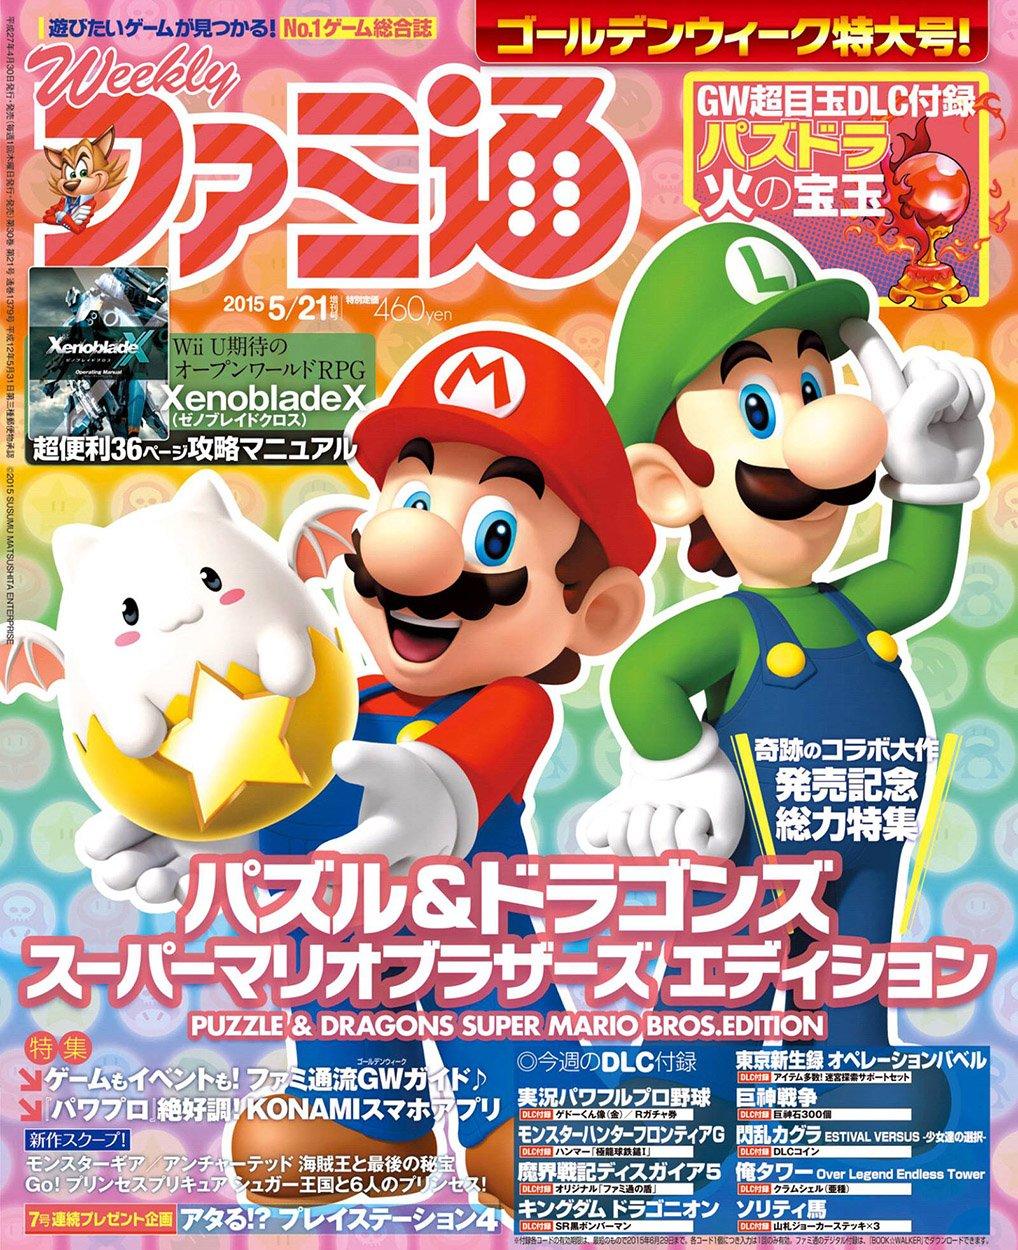 Famitsu 1379 May 21, 2015